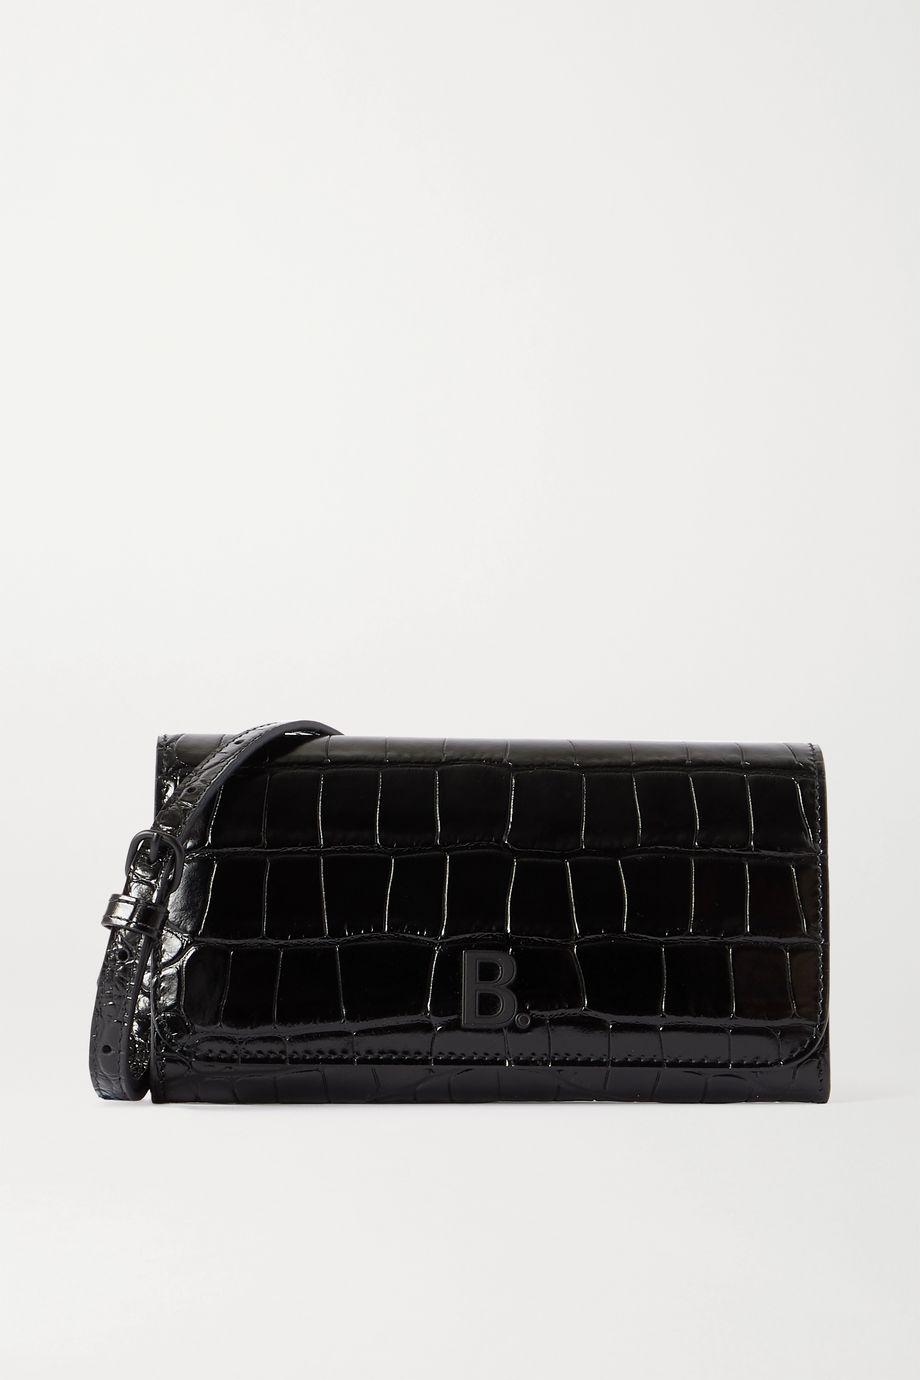 Balenciaga Touch croc-effect leather shoulder bag